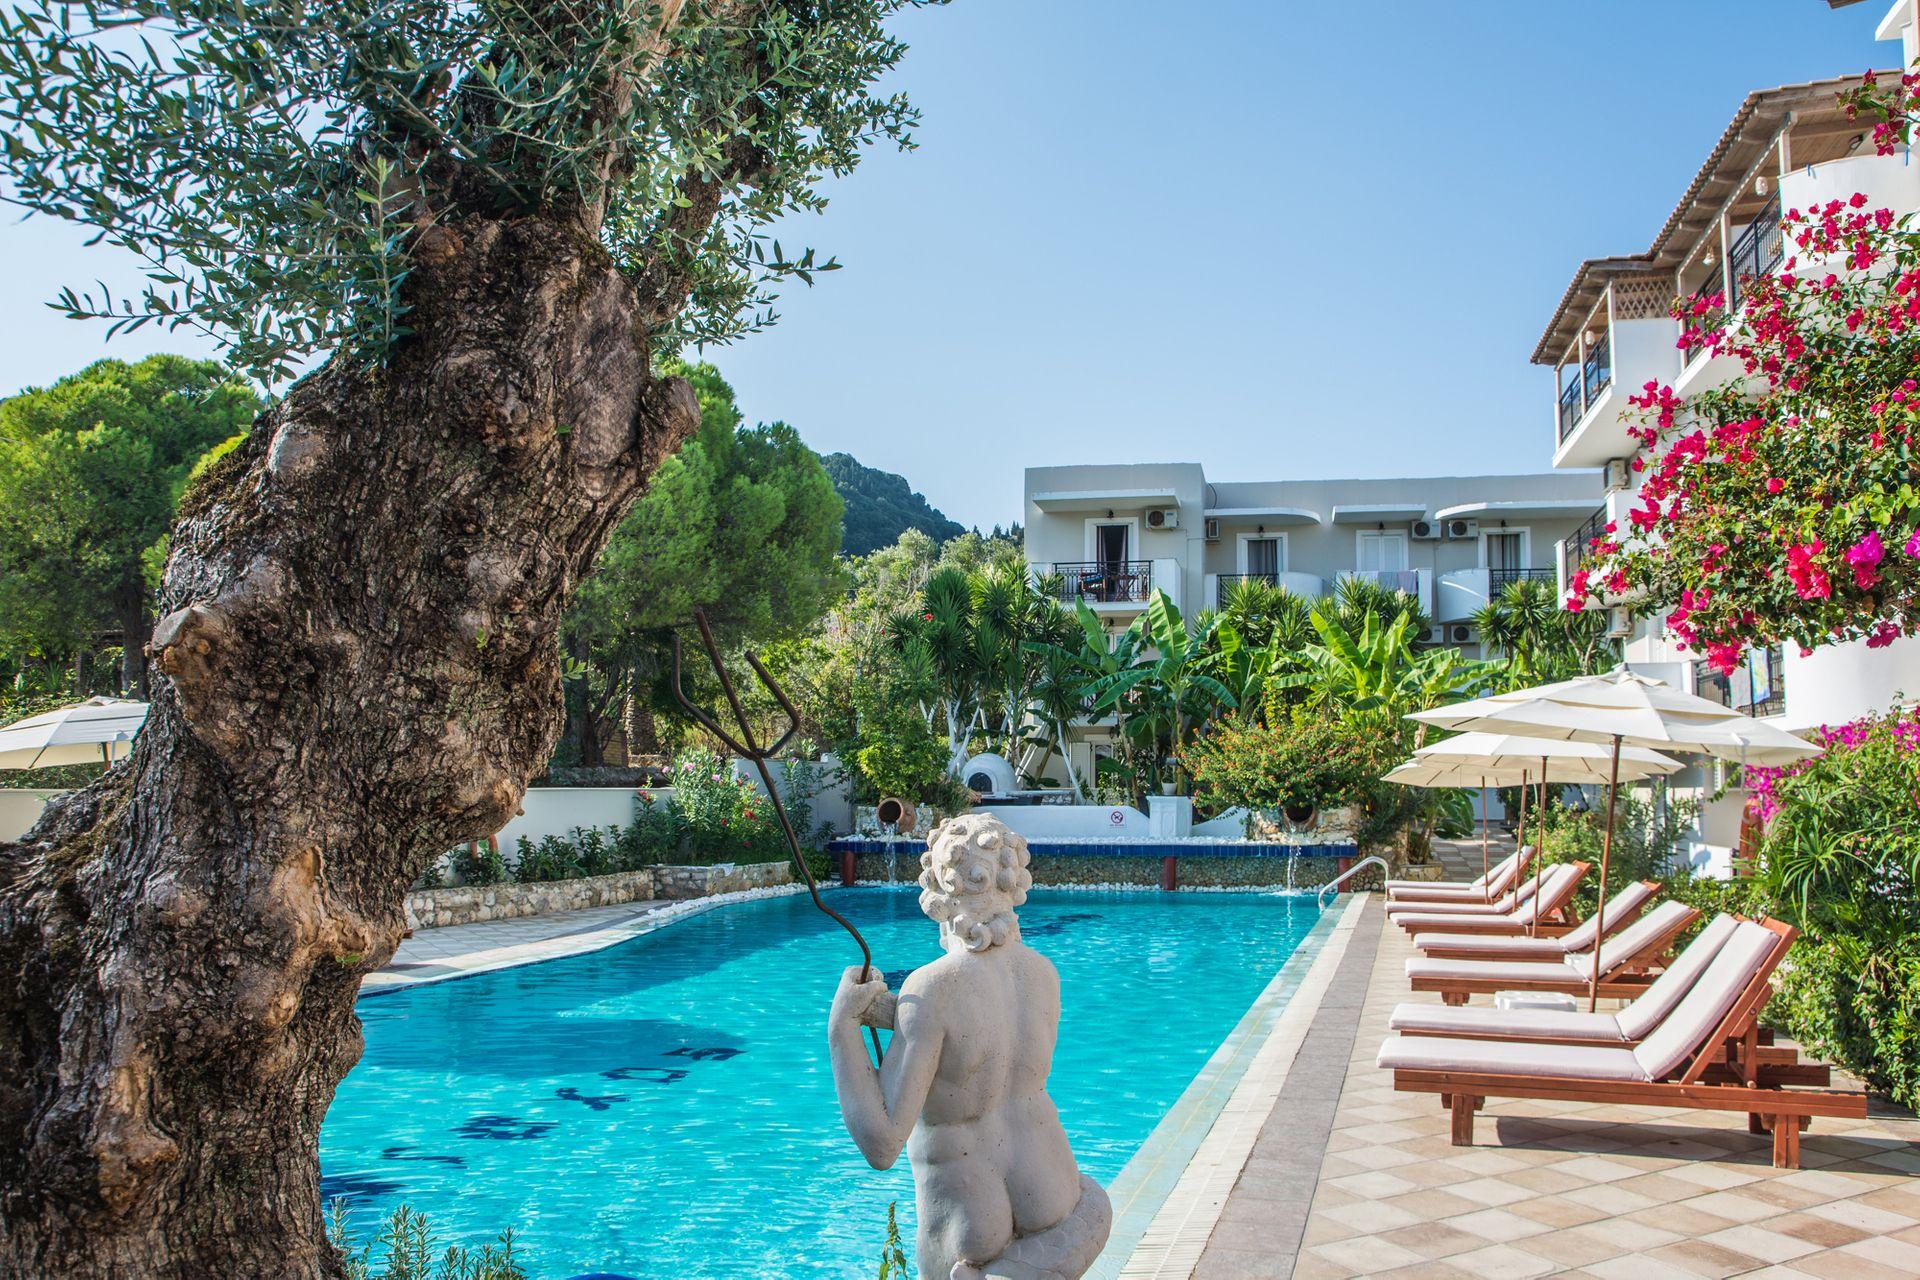 Iniohos Hotel Zakynthos - Ζάκυνθος ✦ -20% ✦ 4 Ημέρες